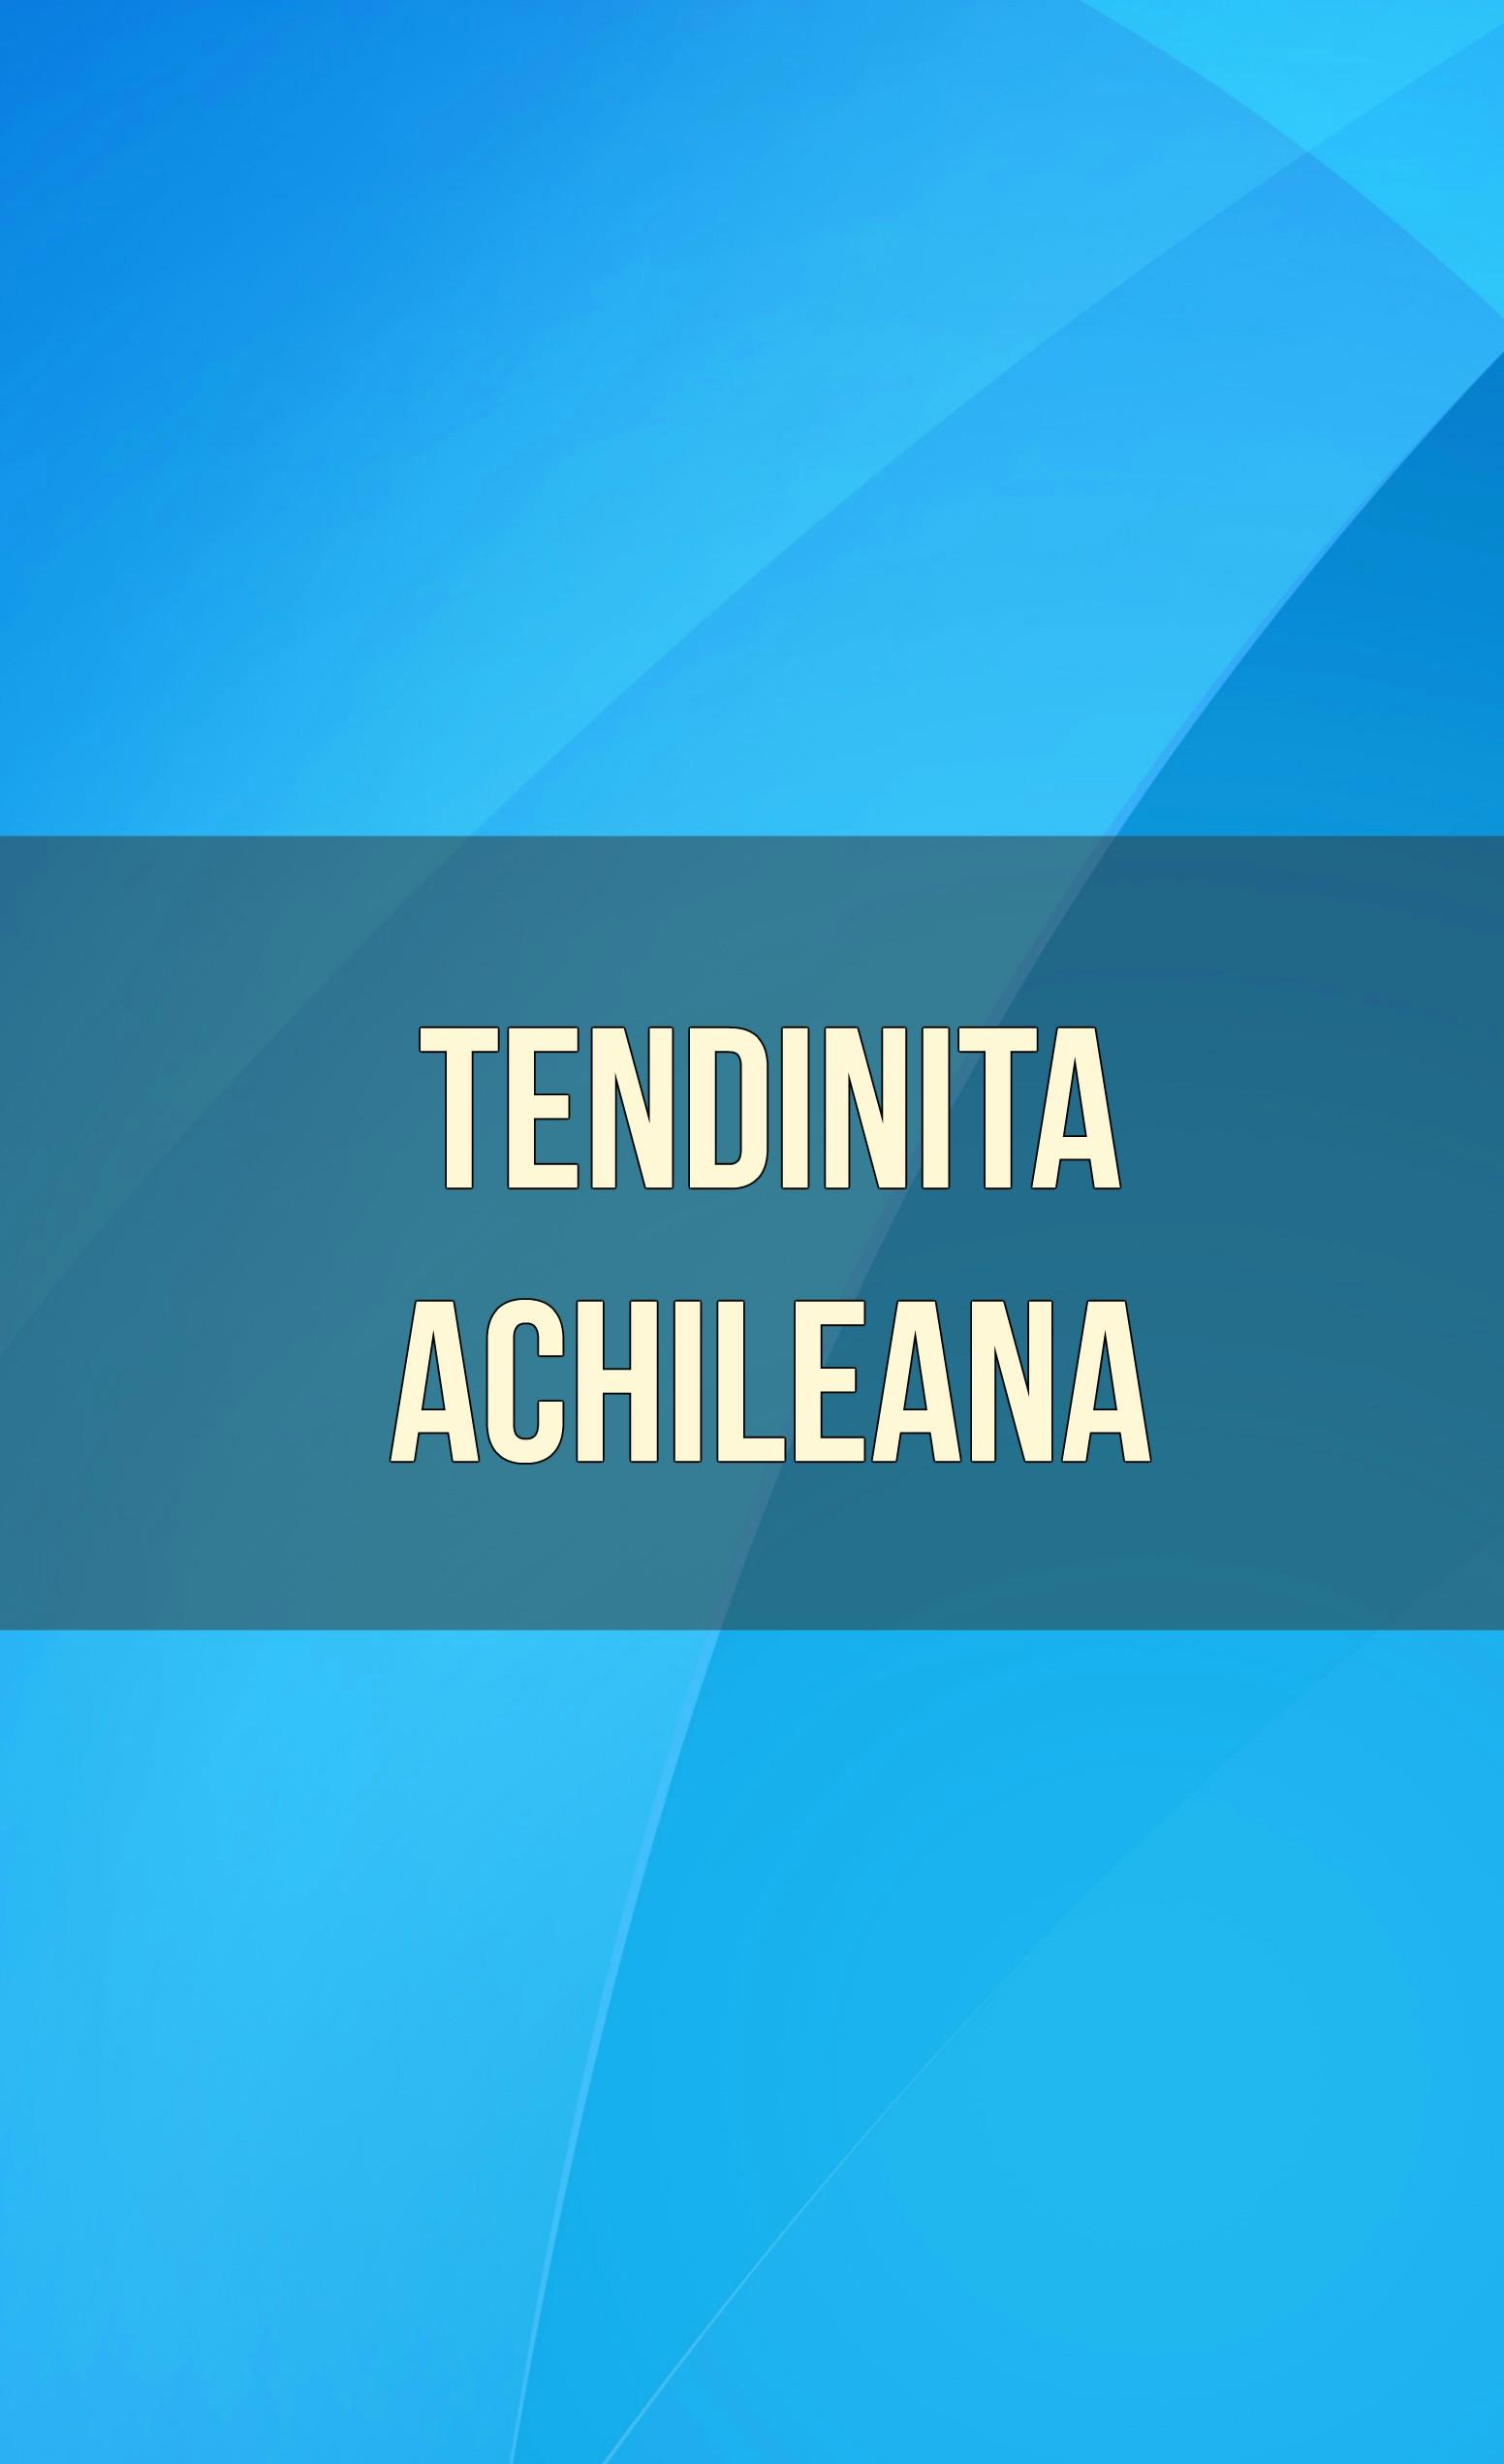 Tendinita Achileana